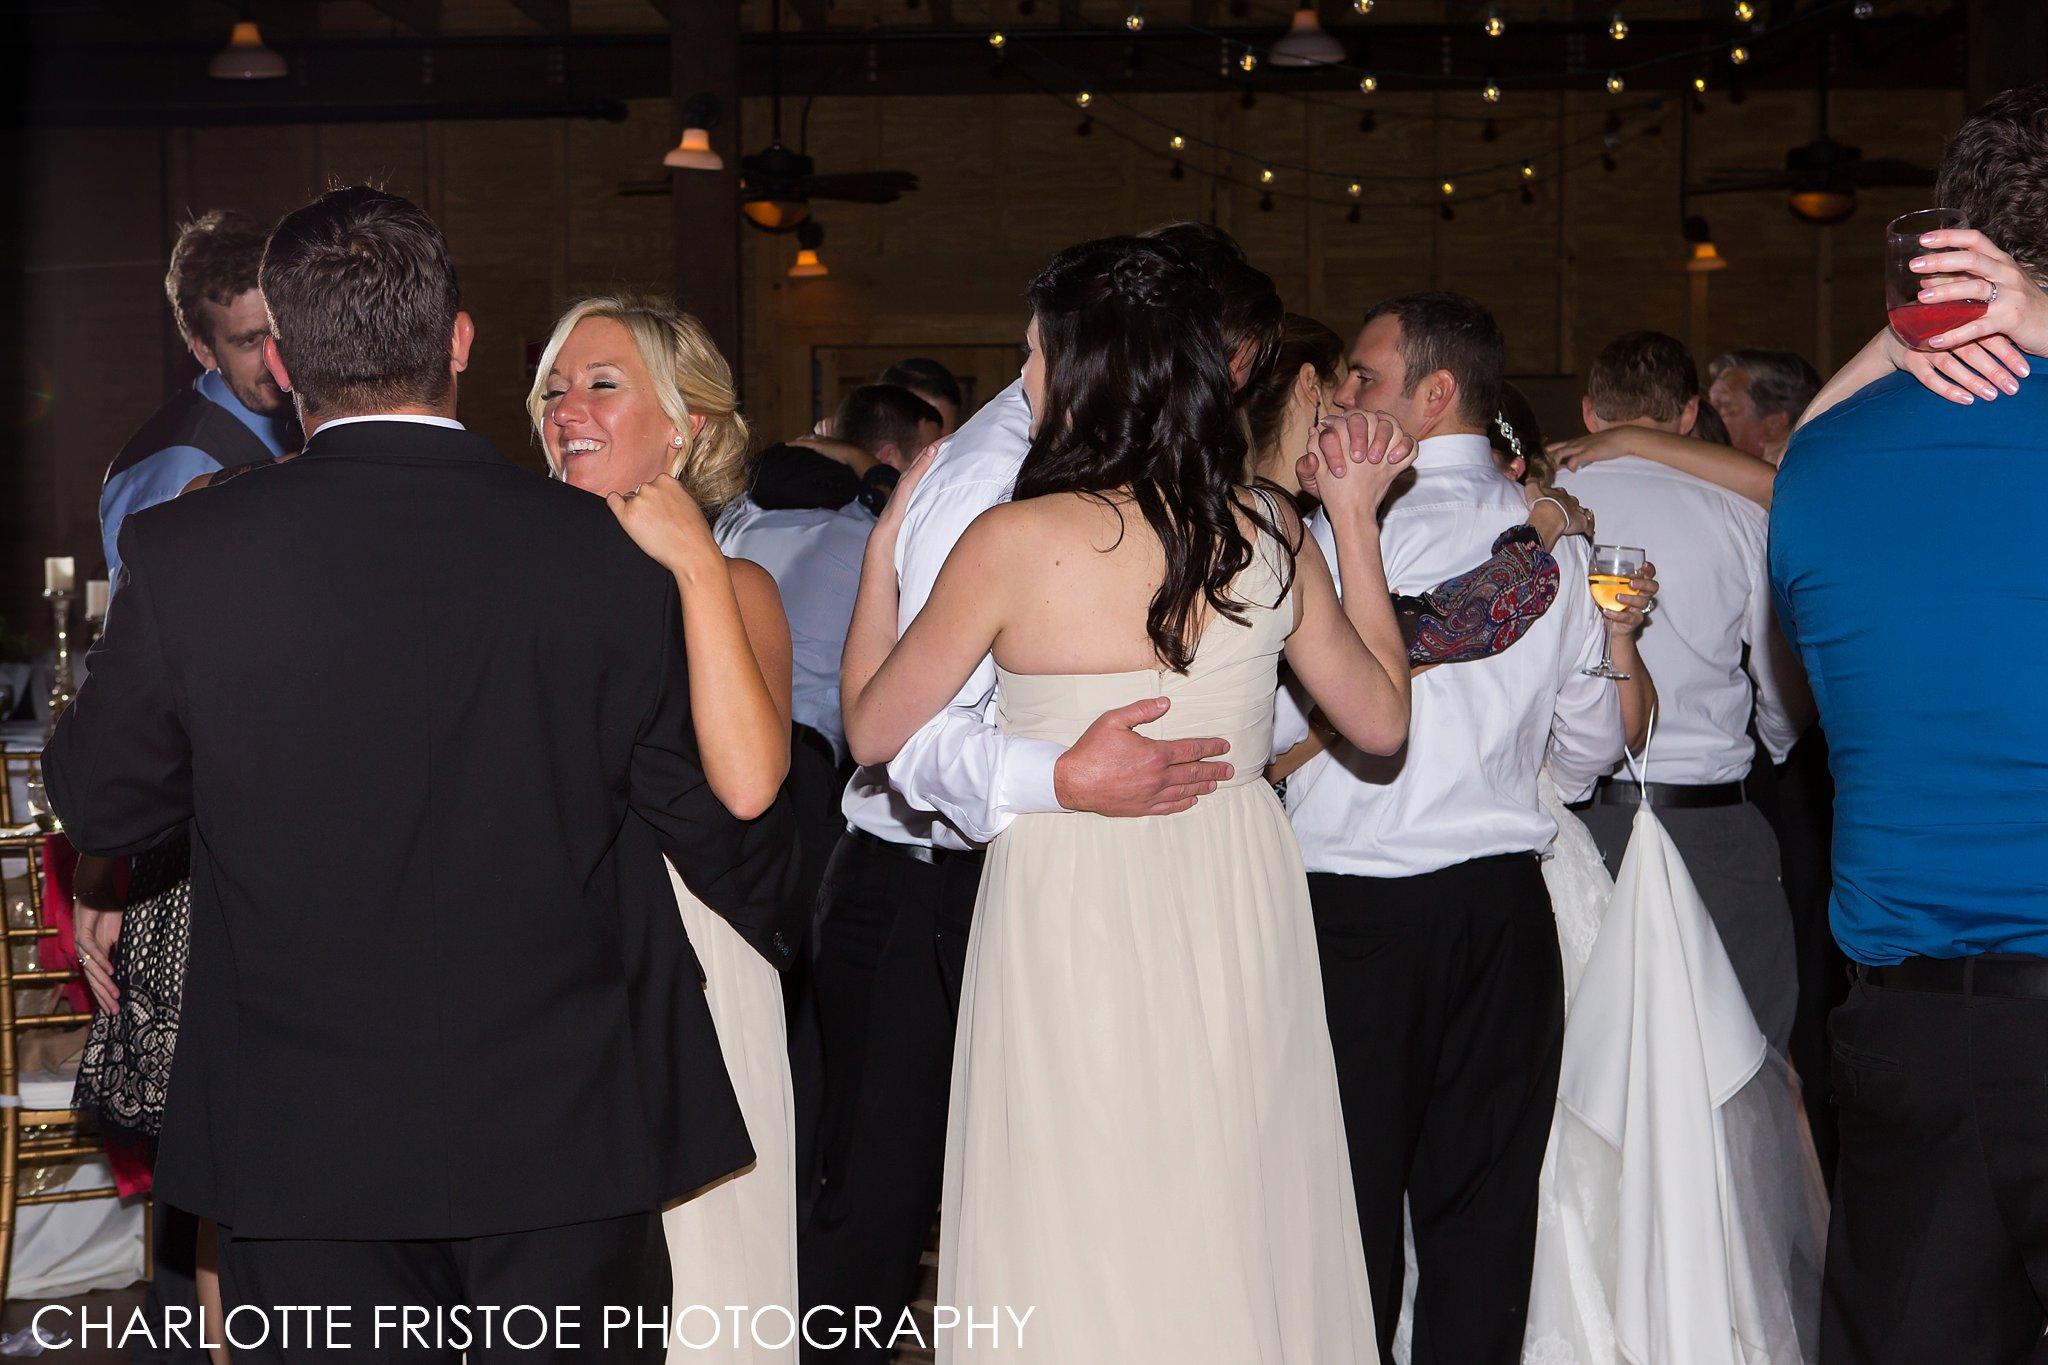 Charlotte Fristoe Photography Blog-75.jpg